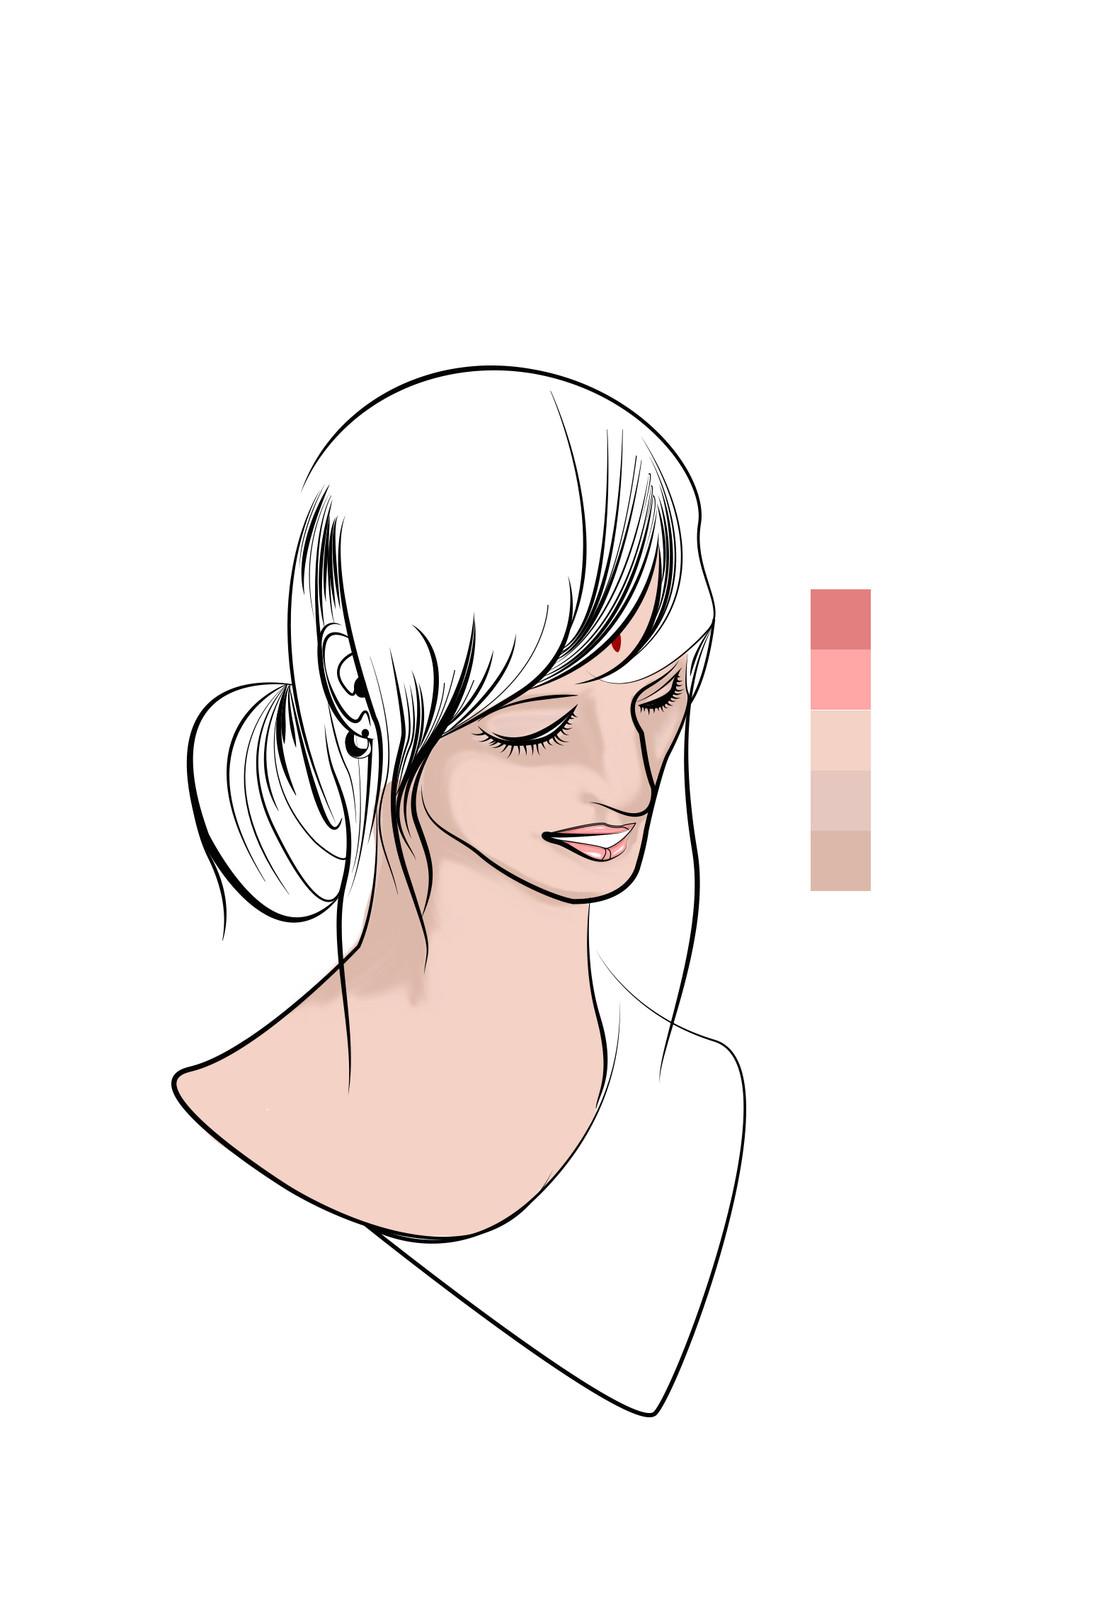 six - Base coloring more detail (Skin)